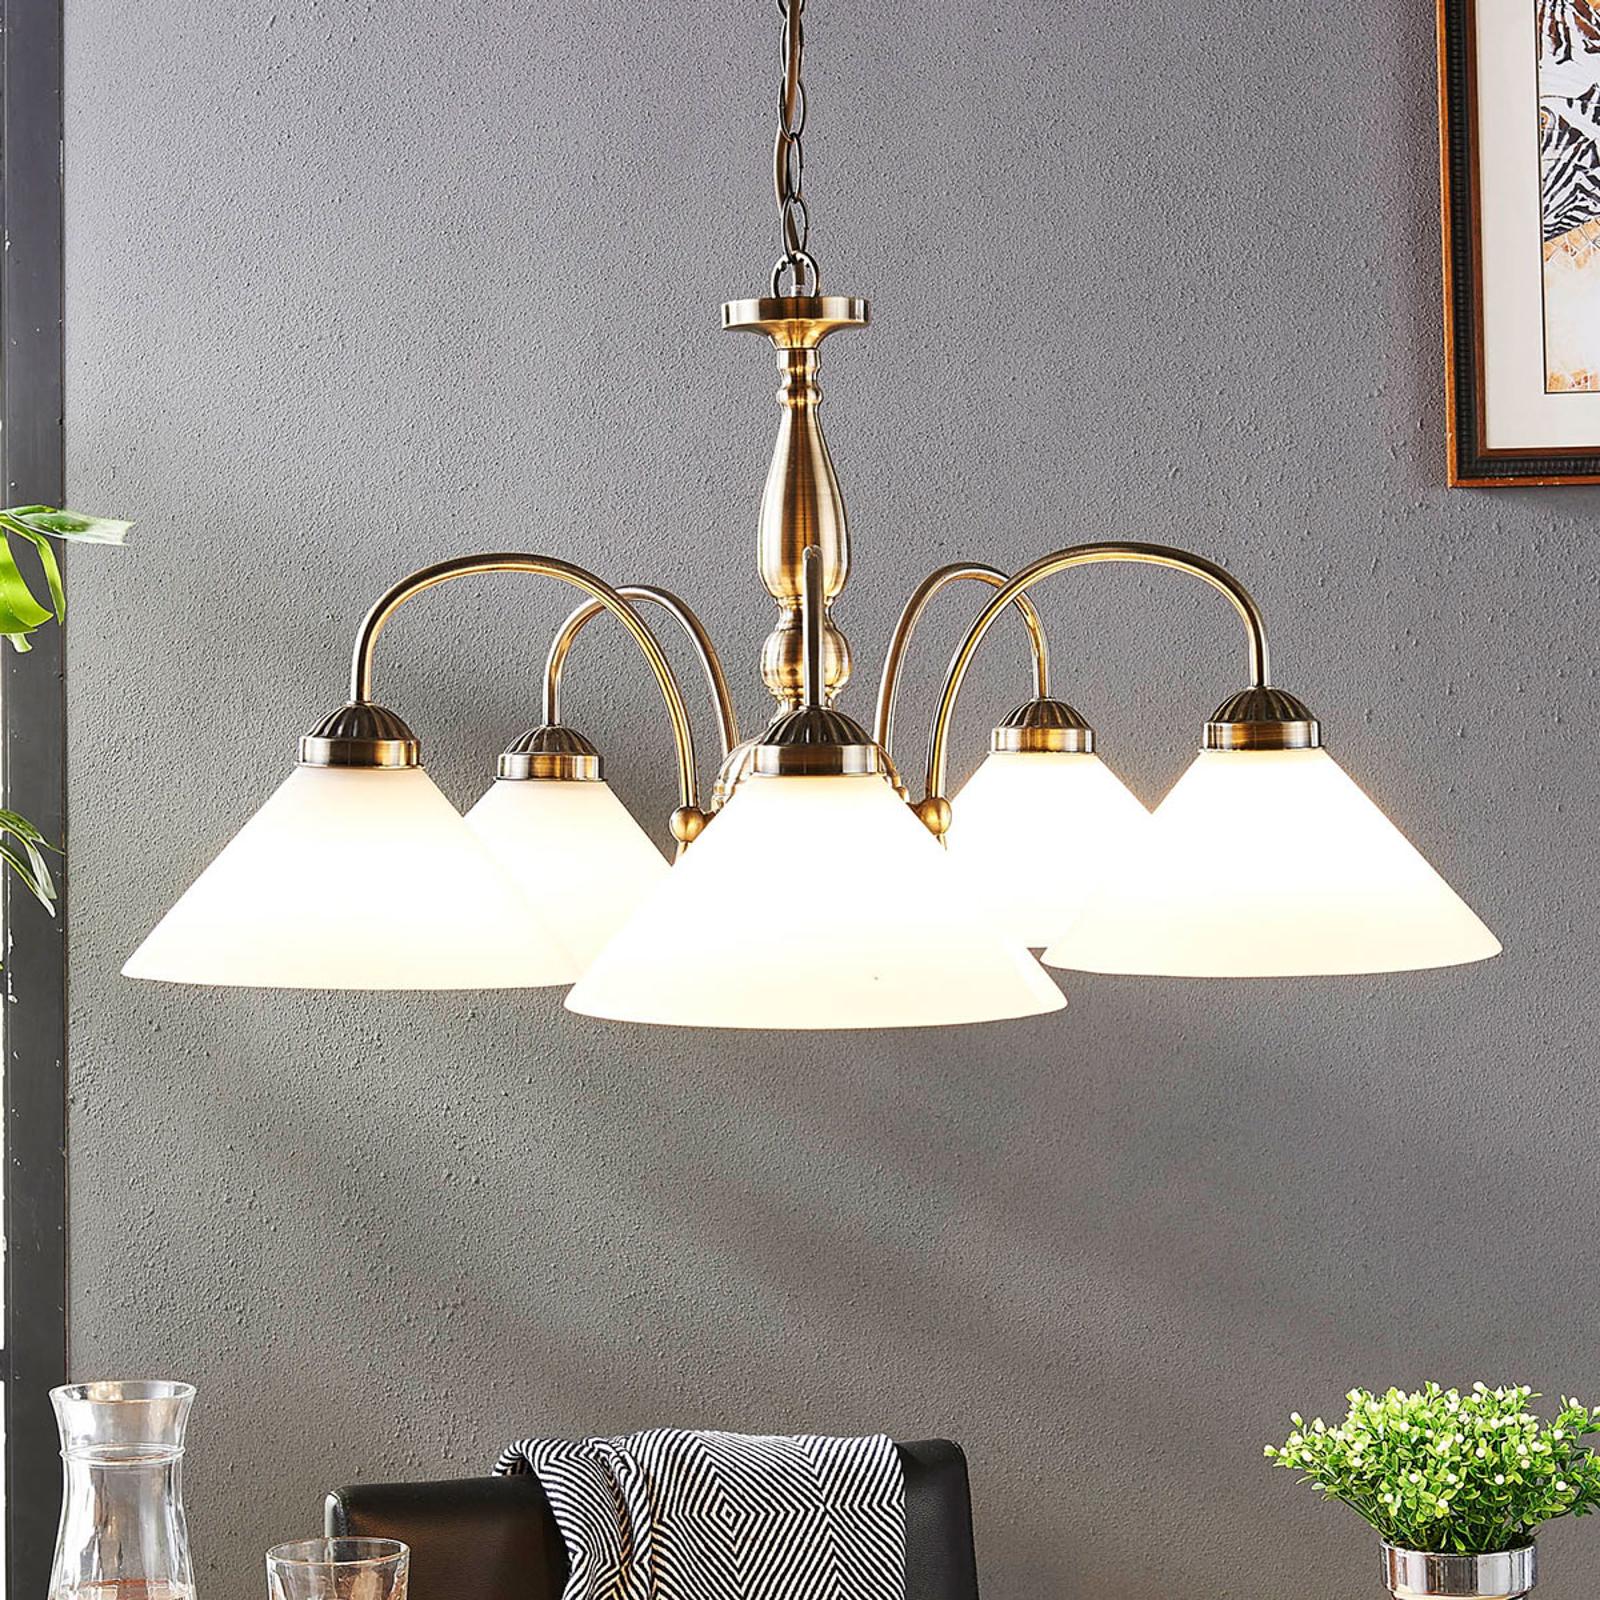 Klassieke hanglamp Otis, vijfflammig